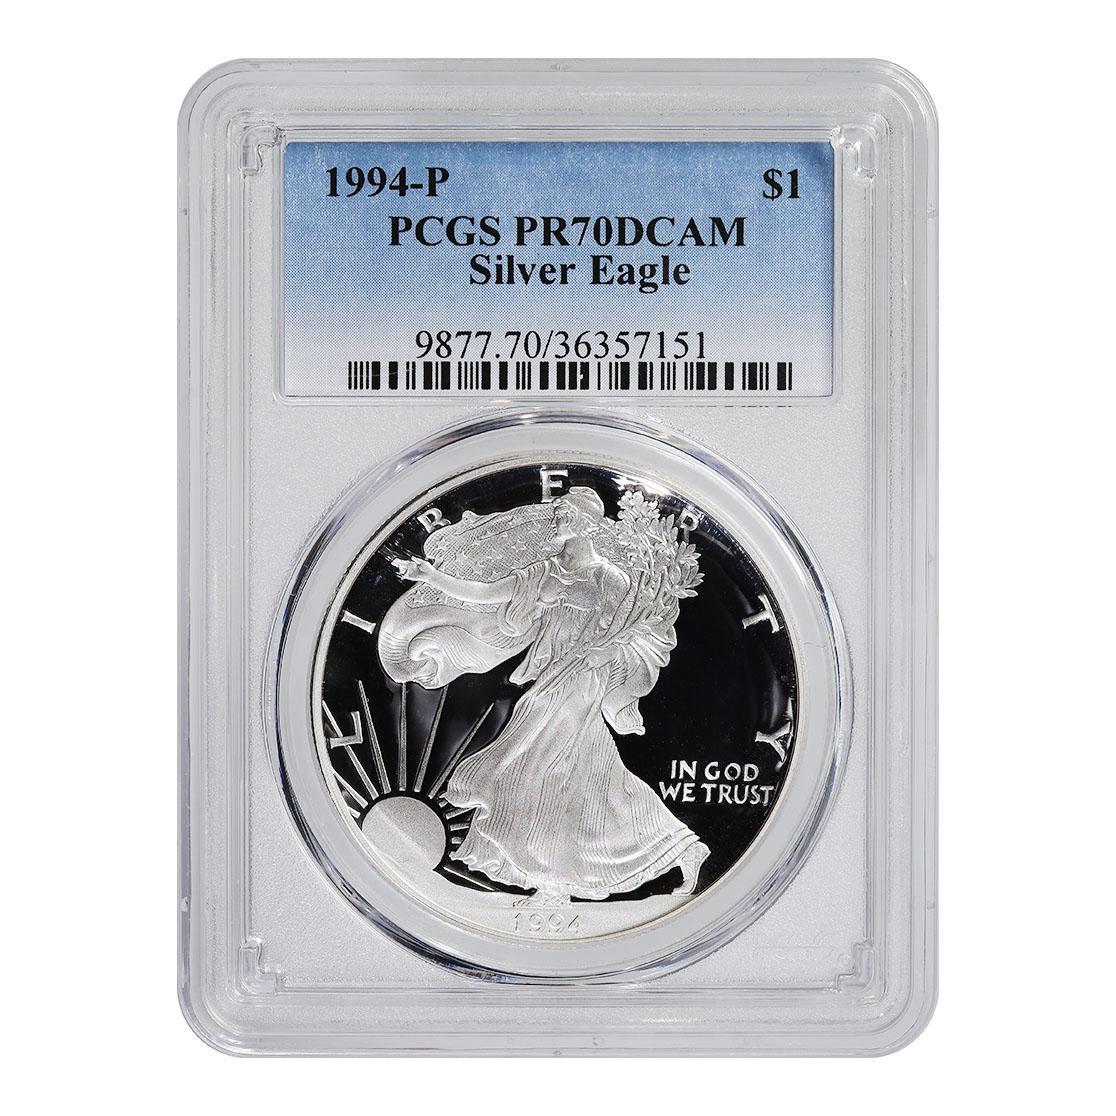 Certified Proof Silver Eagle 1994-P PR70DCAM PCGS